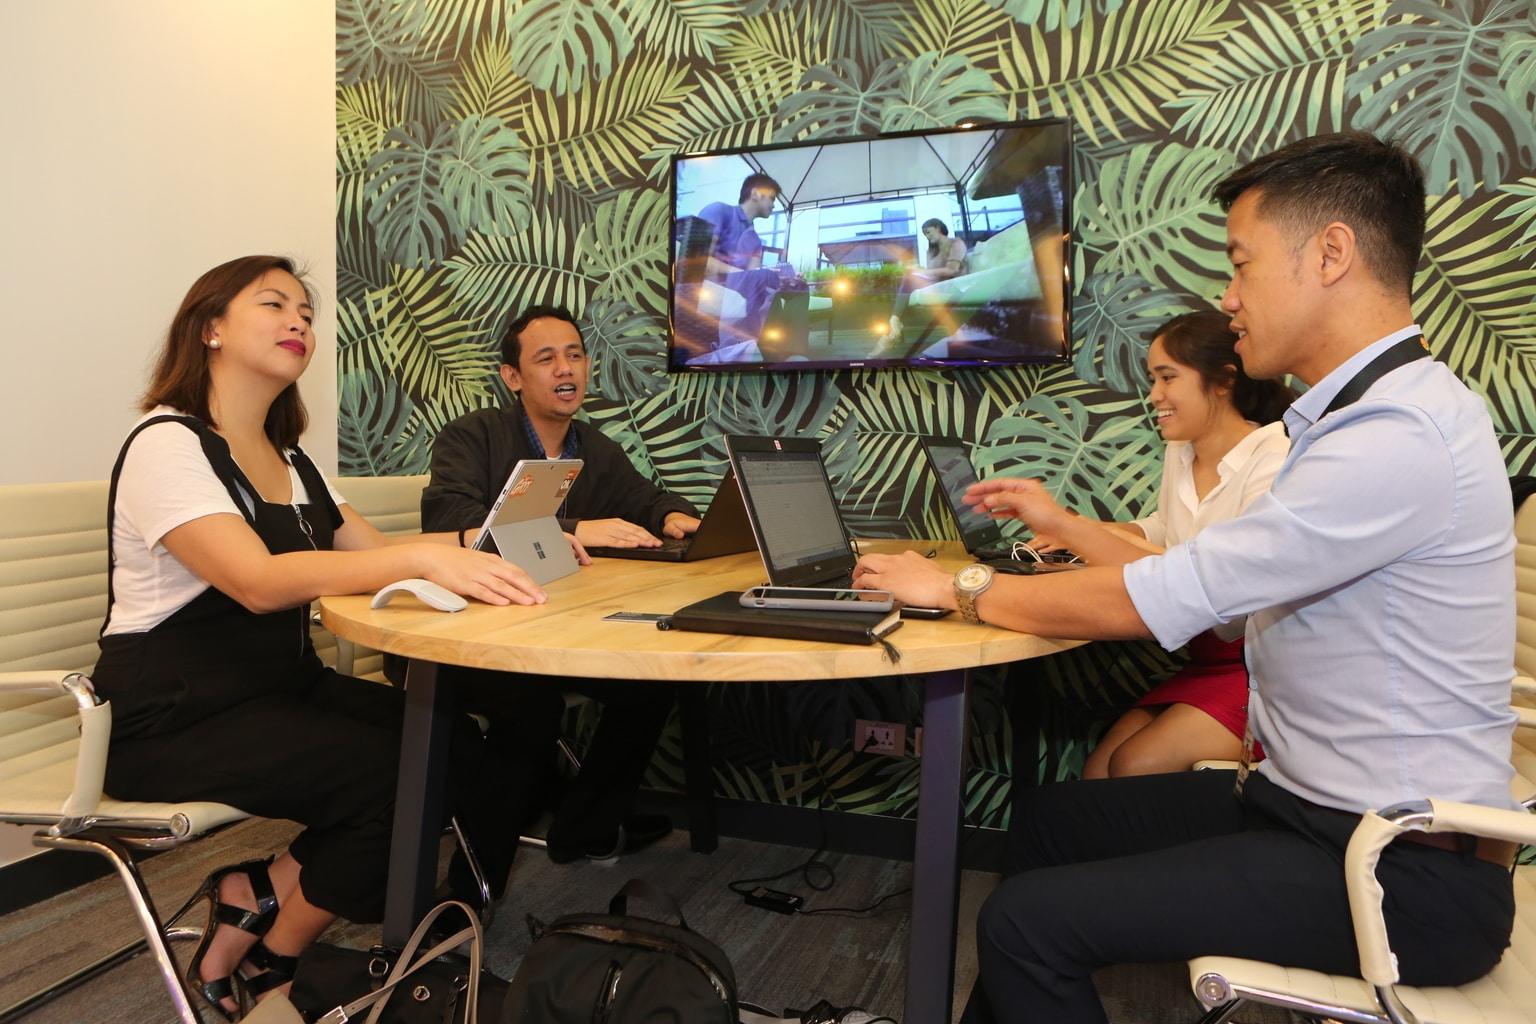 KMC Zeta Tower Meeting Room